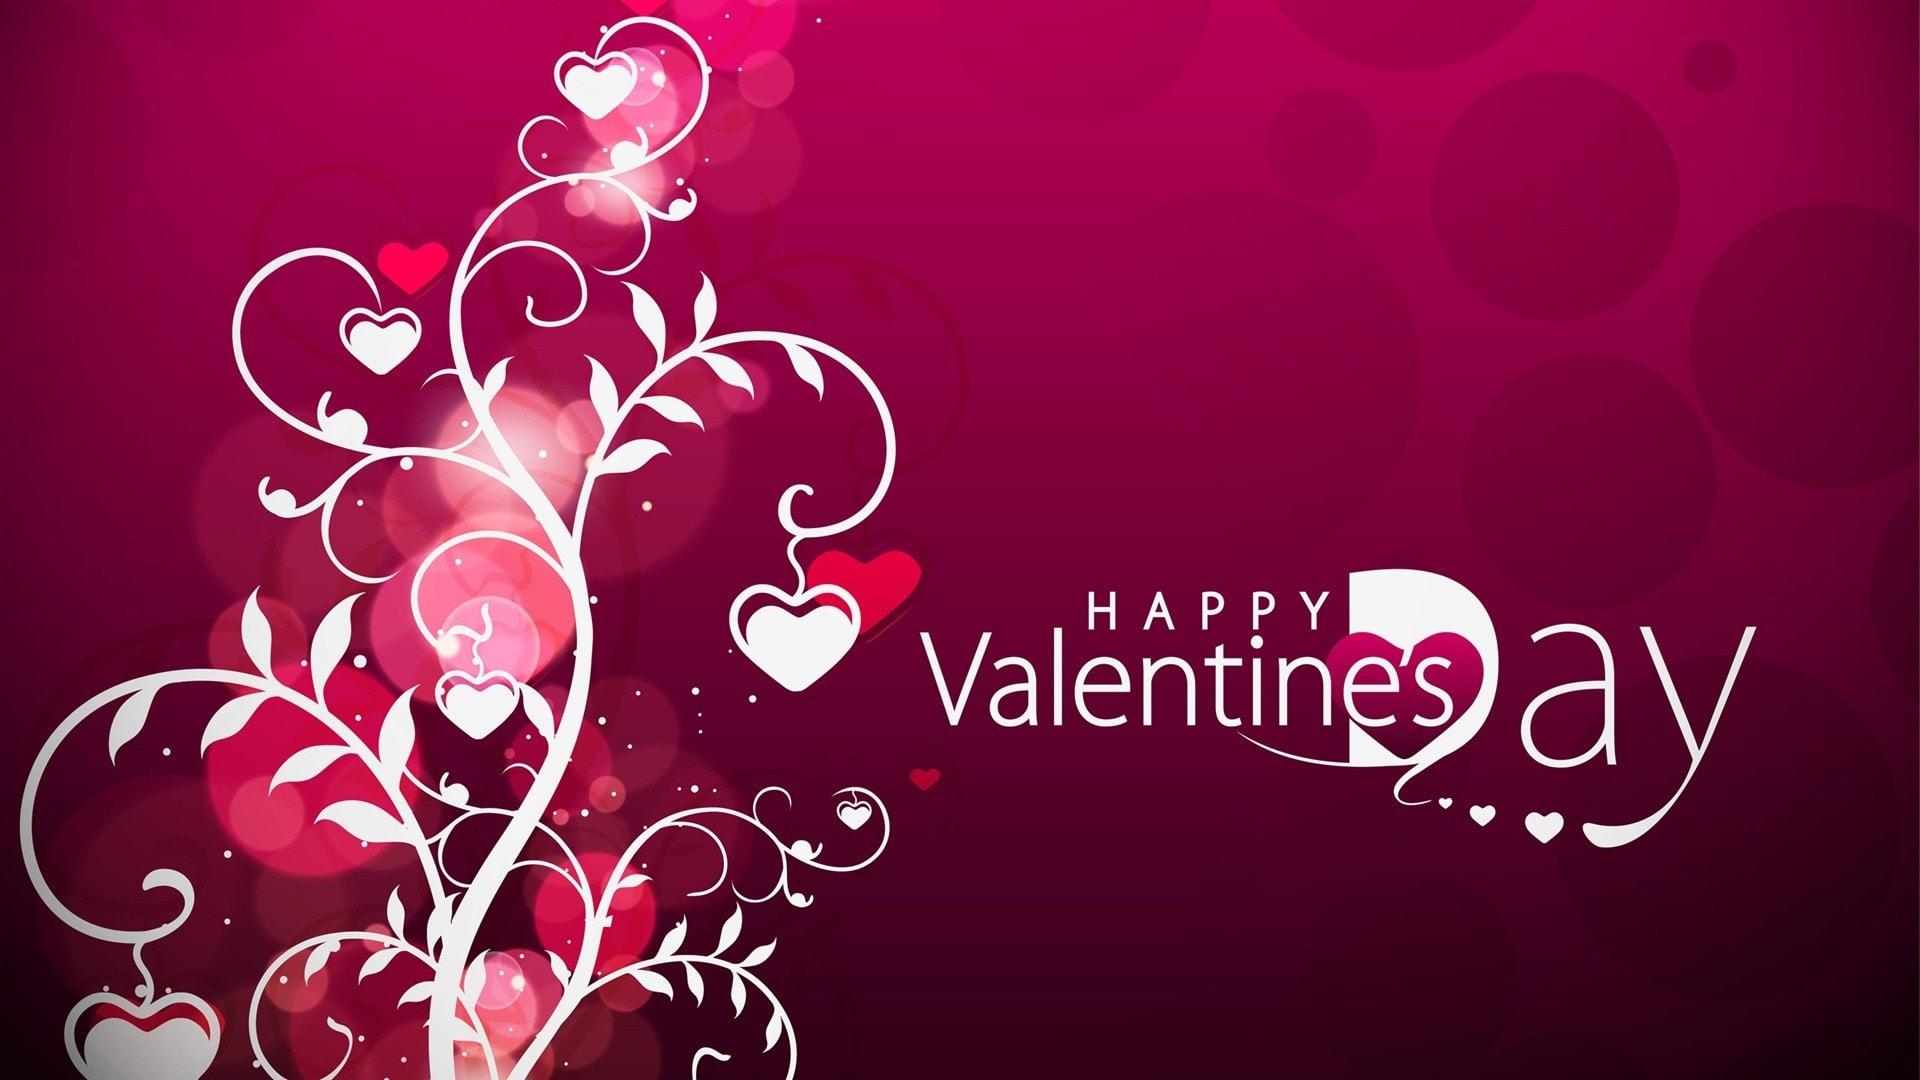 Valentine's Day Desktop wallpaper